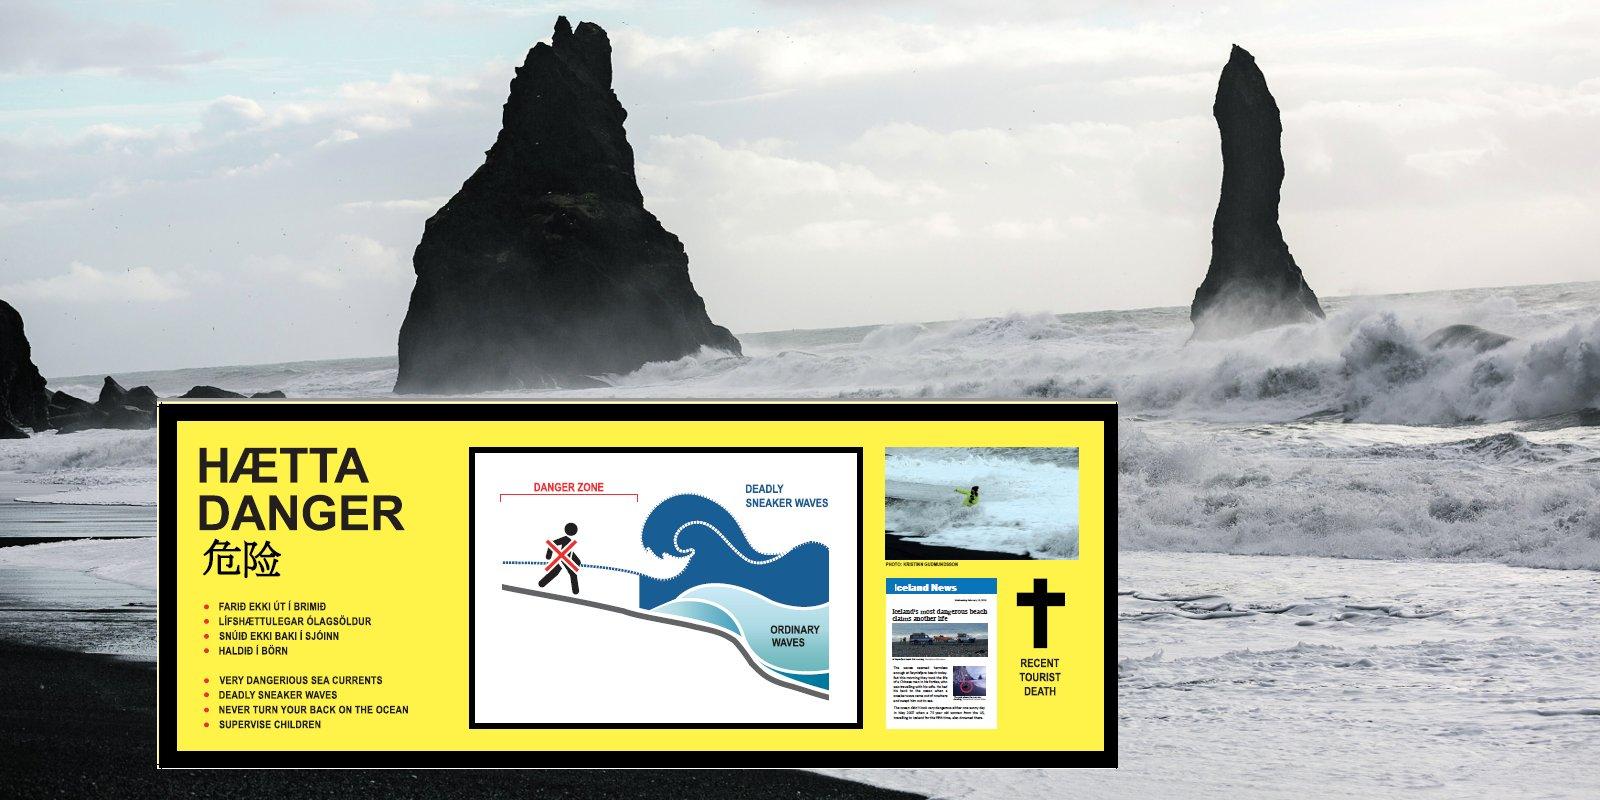 Newer Hazard Sign Goes Up At Reynisfjara Beach - The Reykjavik Grapevine